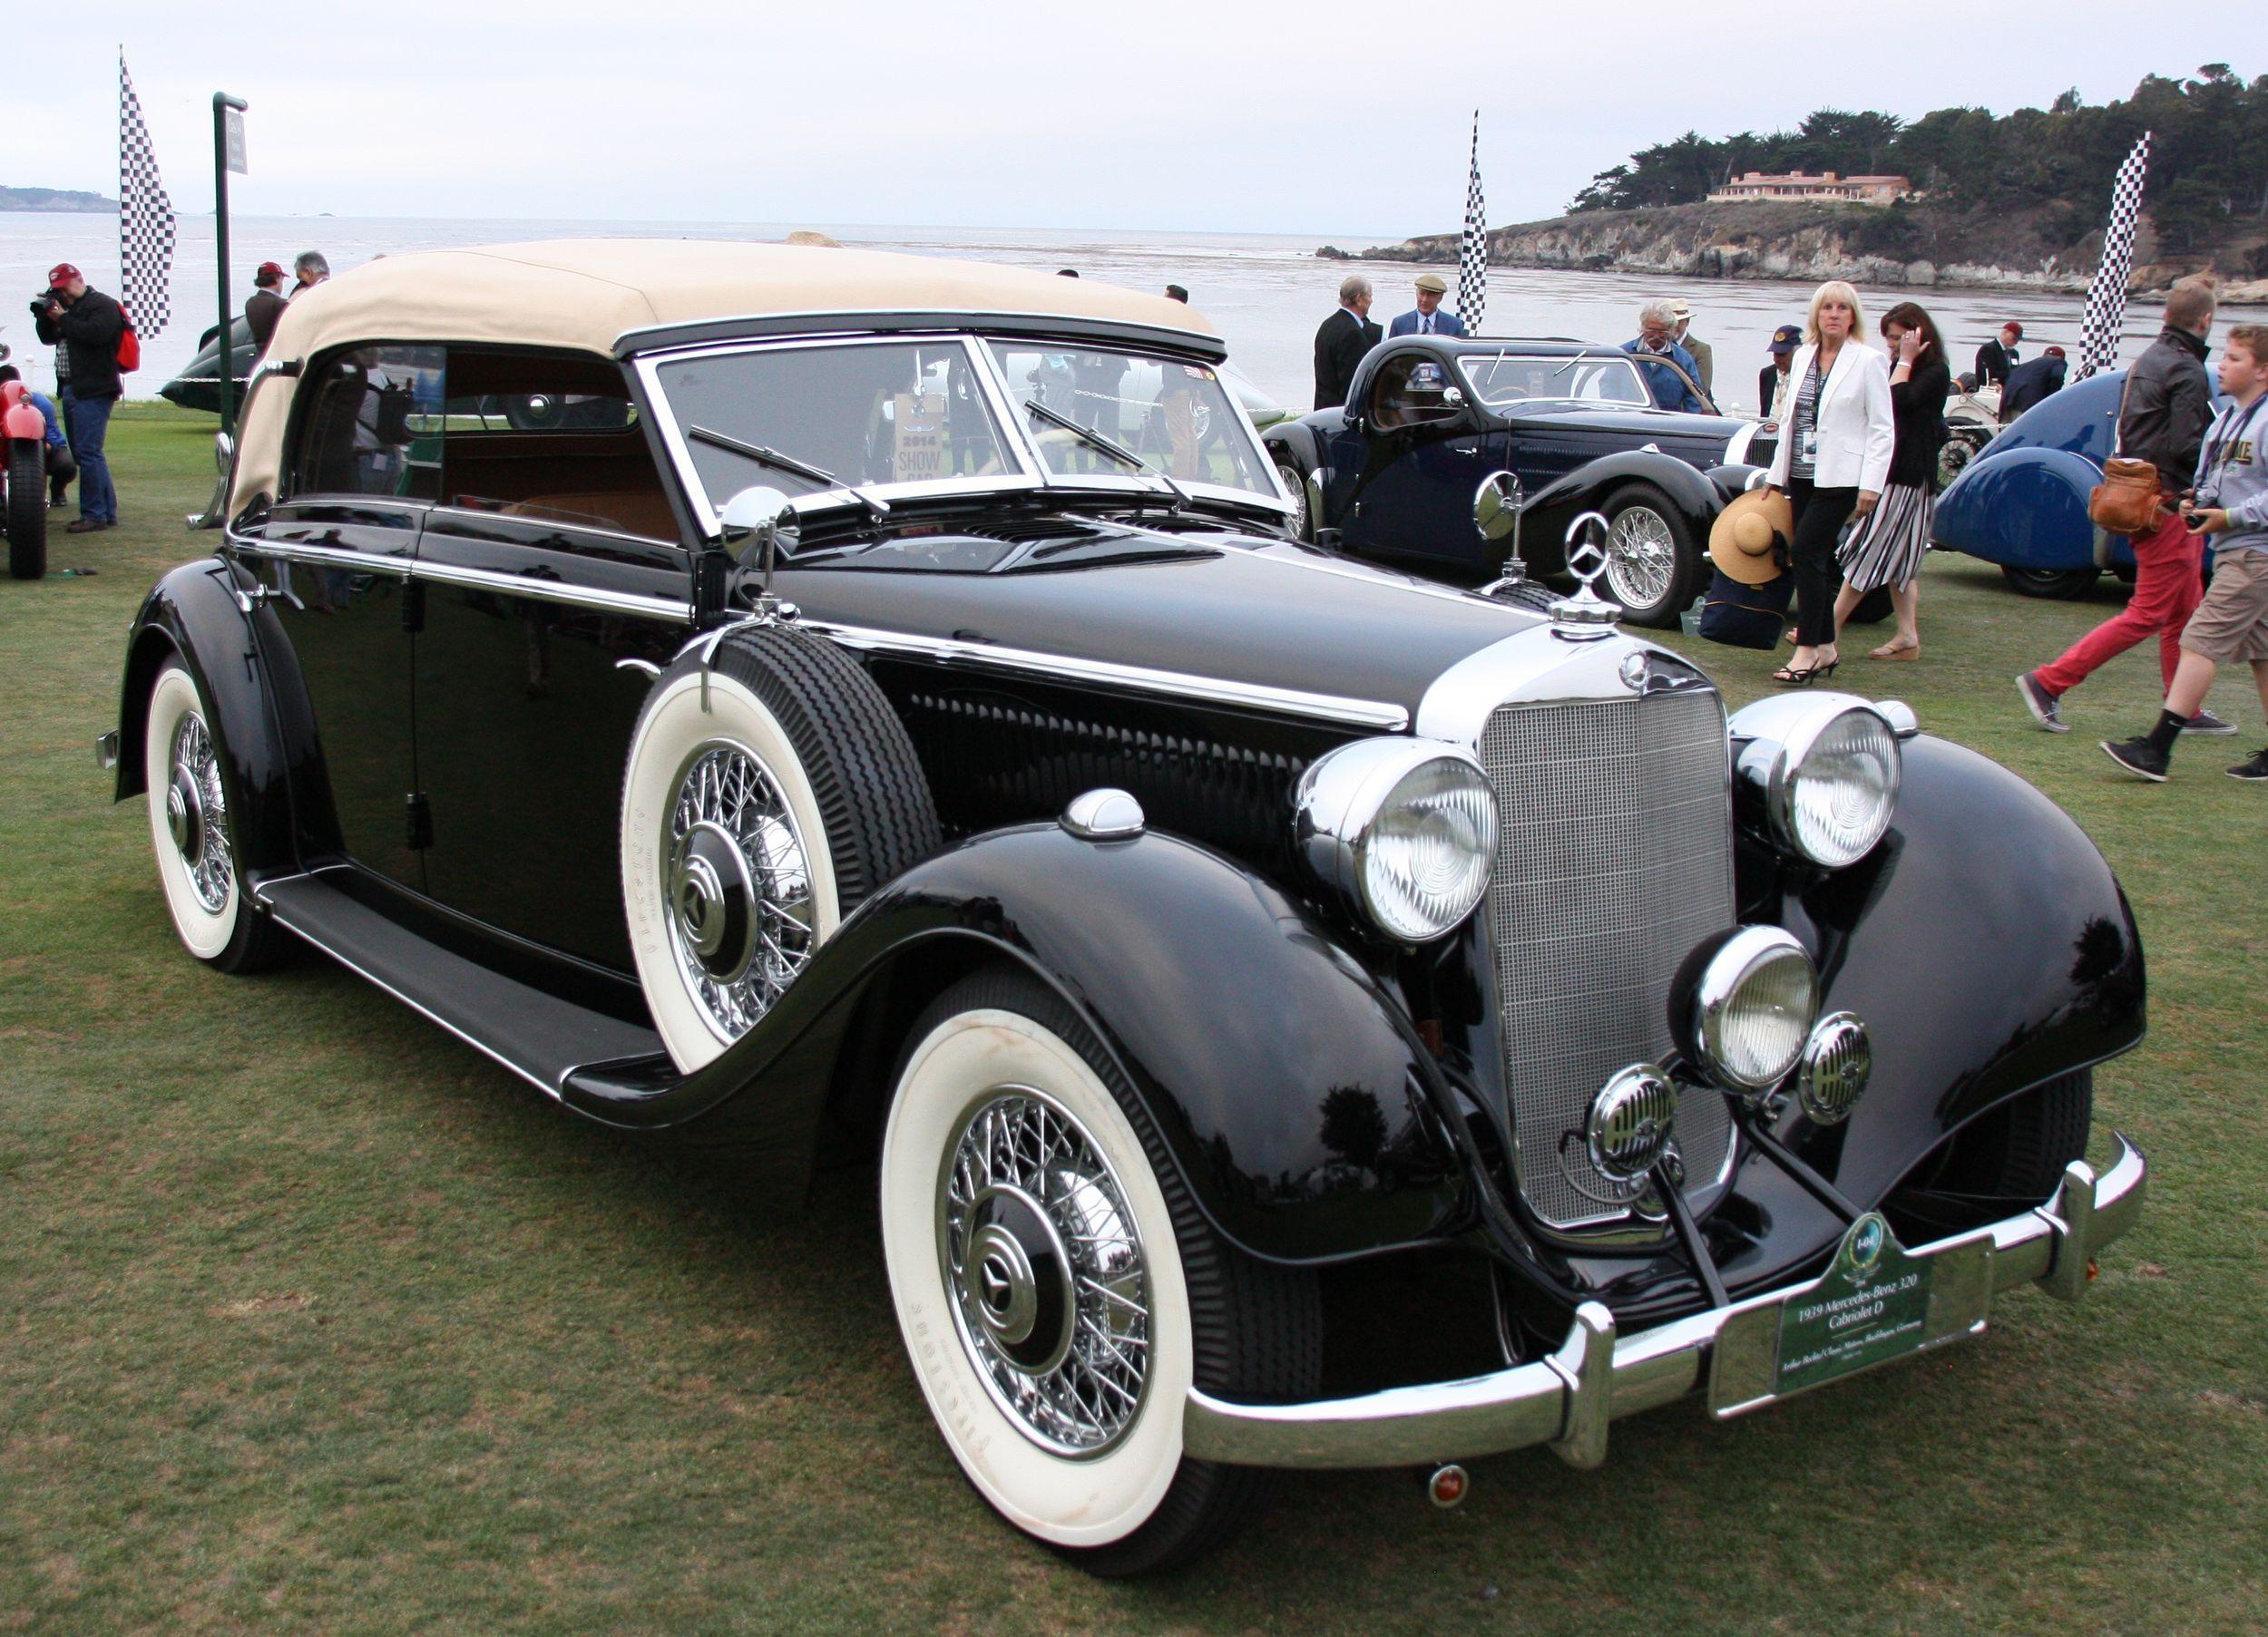 1939 Mercedes-Benz 320 Cabriolet   Automobiles   Pinterest   Benz ...